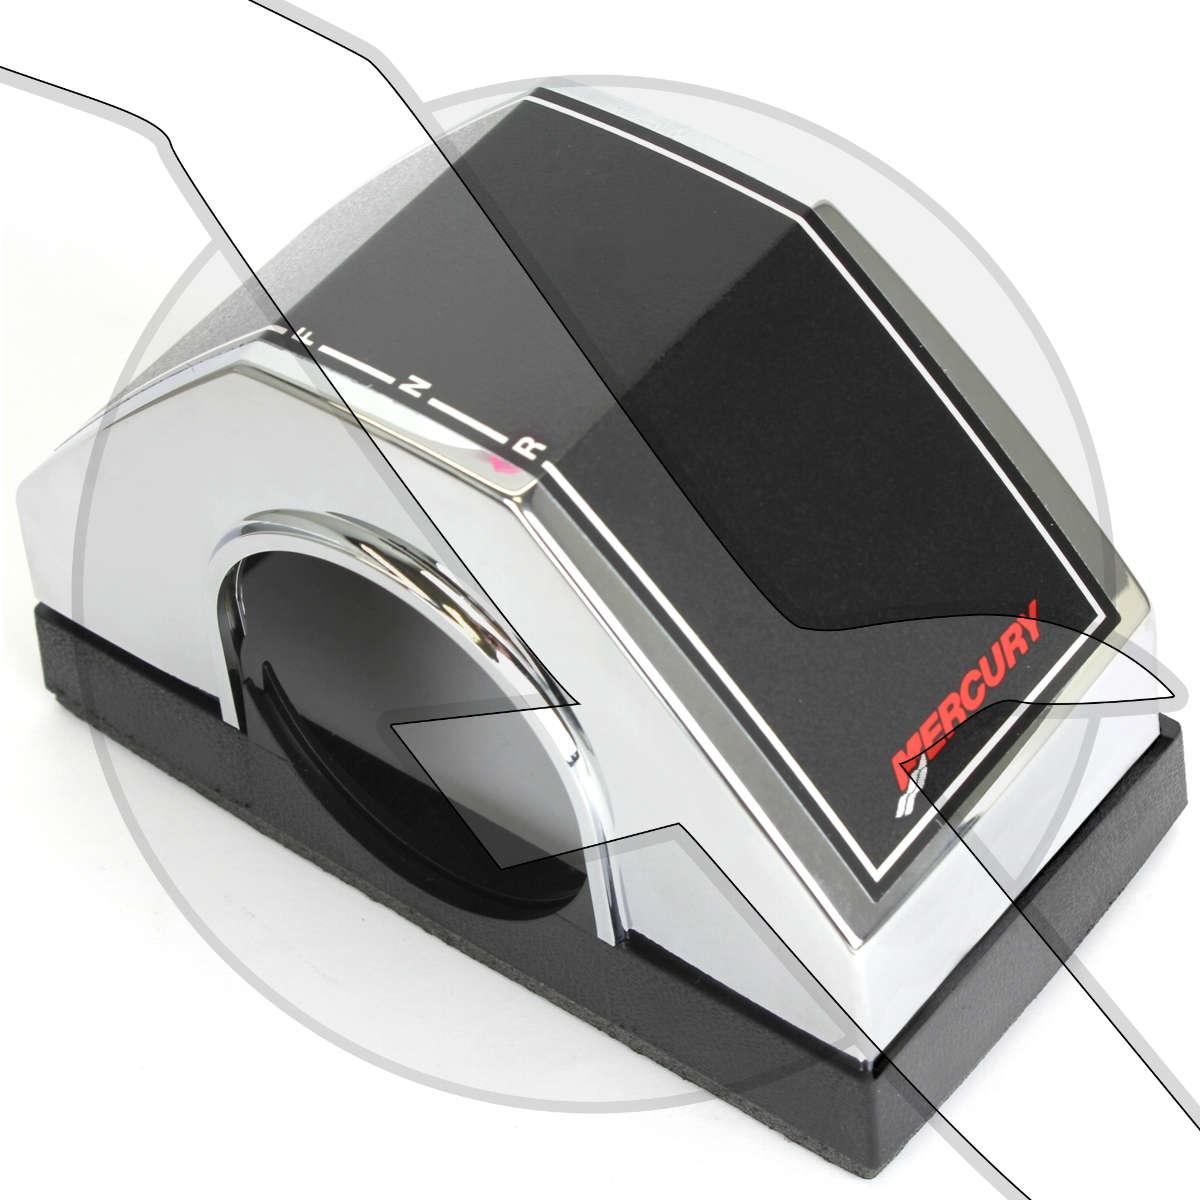 14389a2 mercruisermercury outboard throttleshift control box 14389a2 cover sciox Gallery